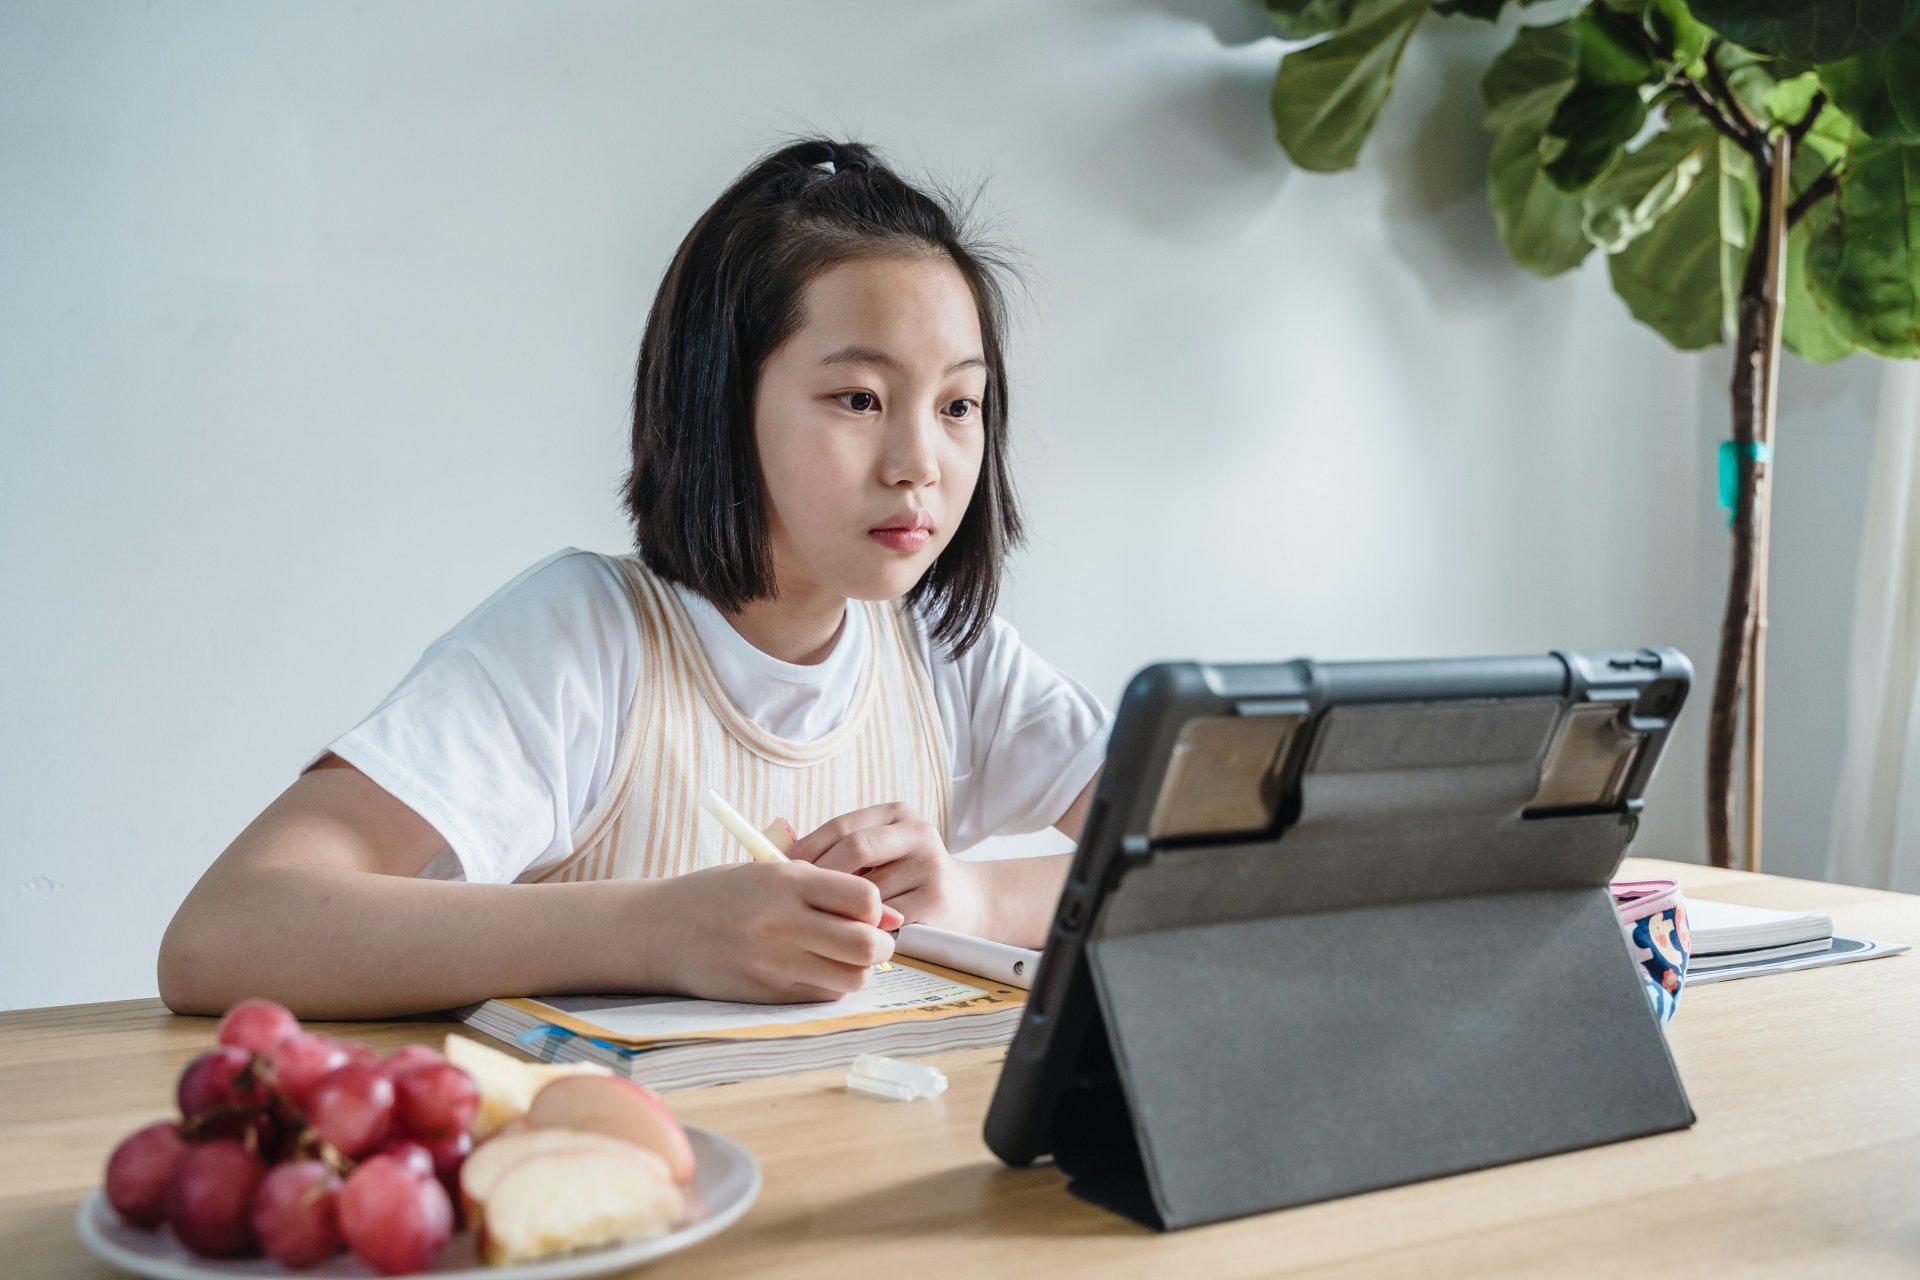 Adaptive Learning: The Digital Era of Education